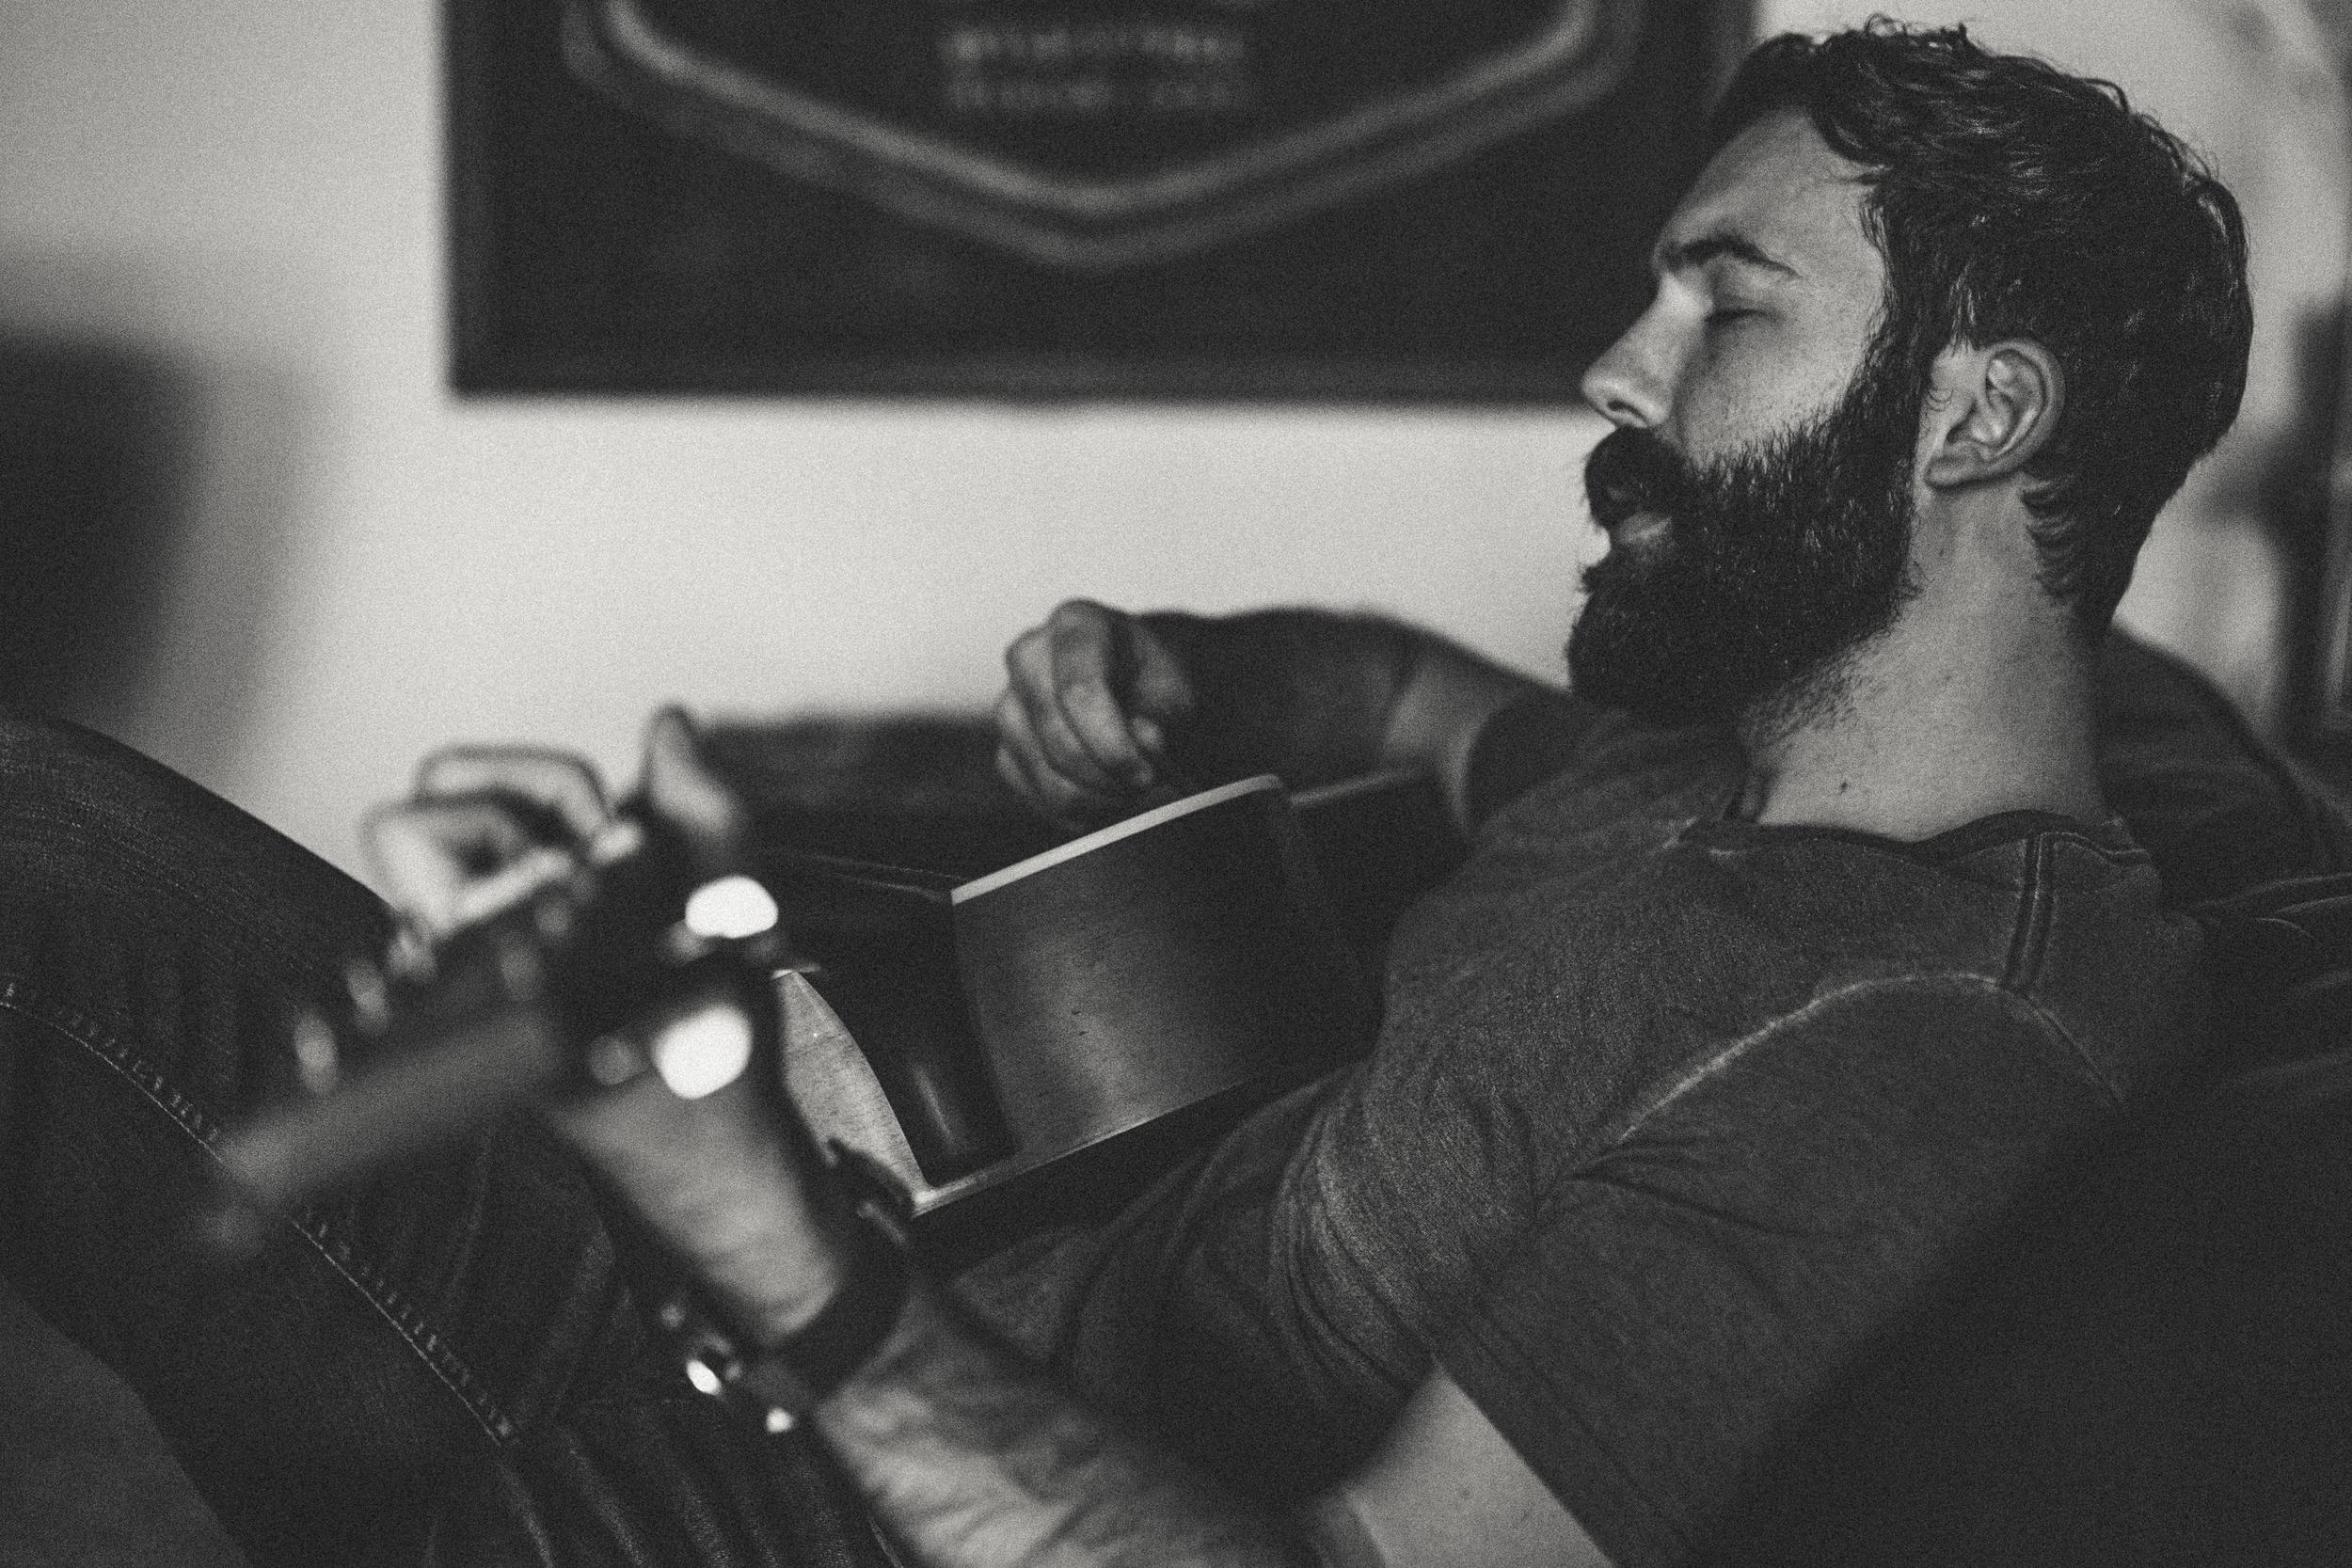 Daniel Alkato Playing Acoustic Guitar beard Black and White